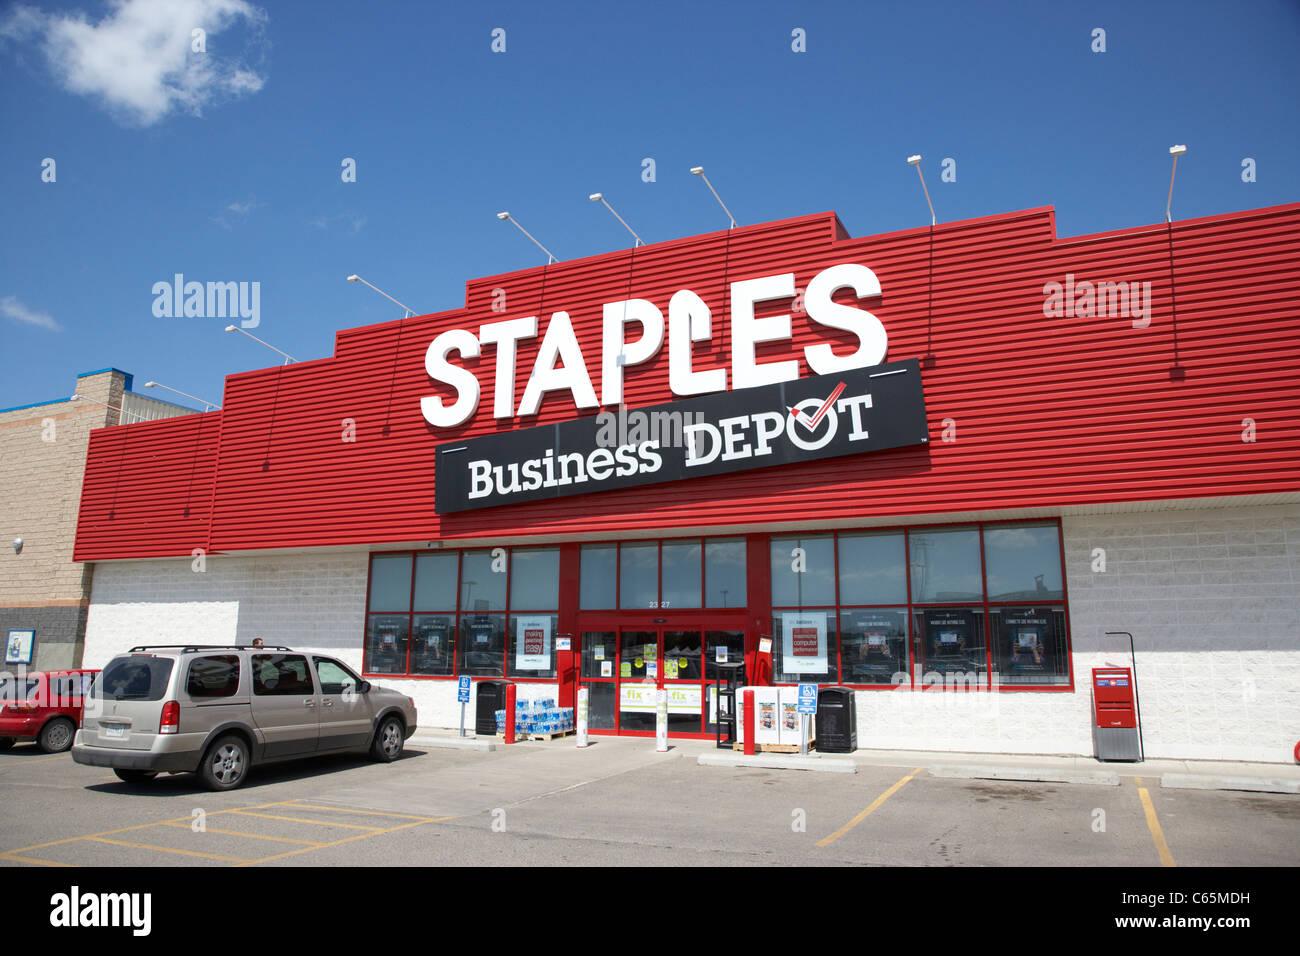 Staples Geschäft Depot Filiale Saskatoon Saskatchewan Kanada